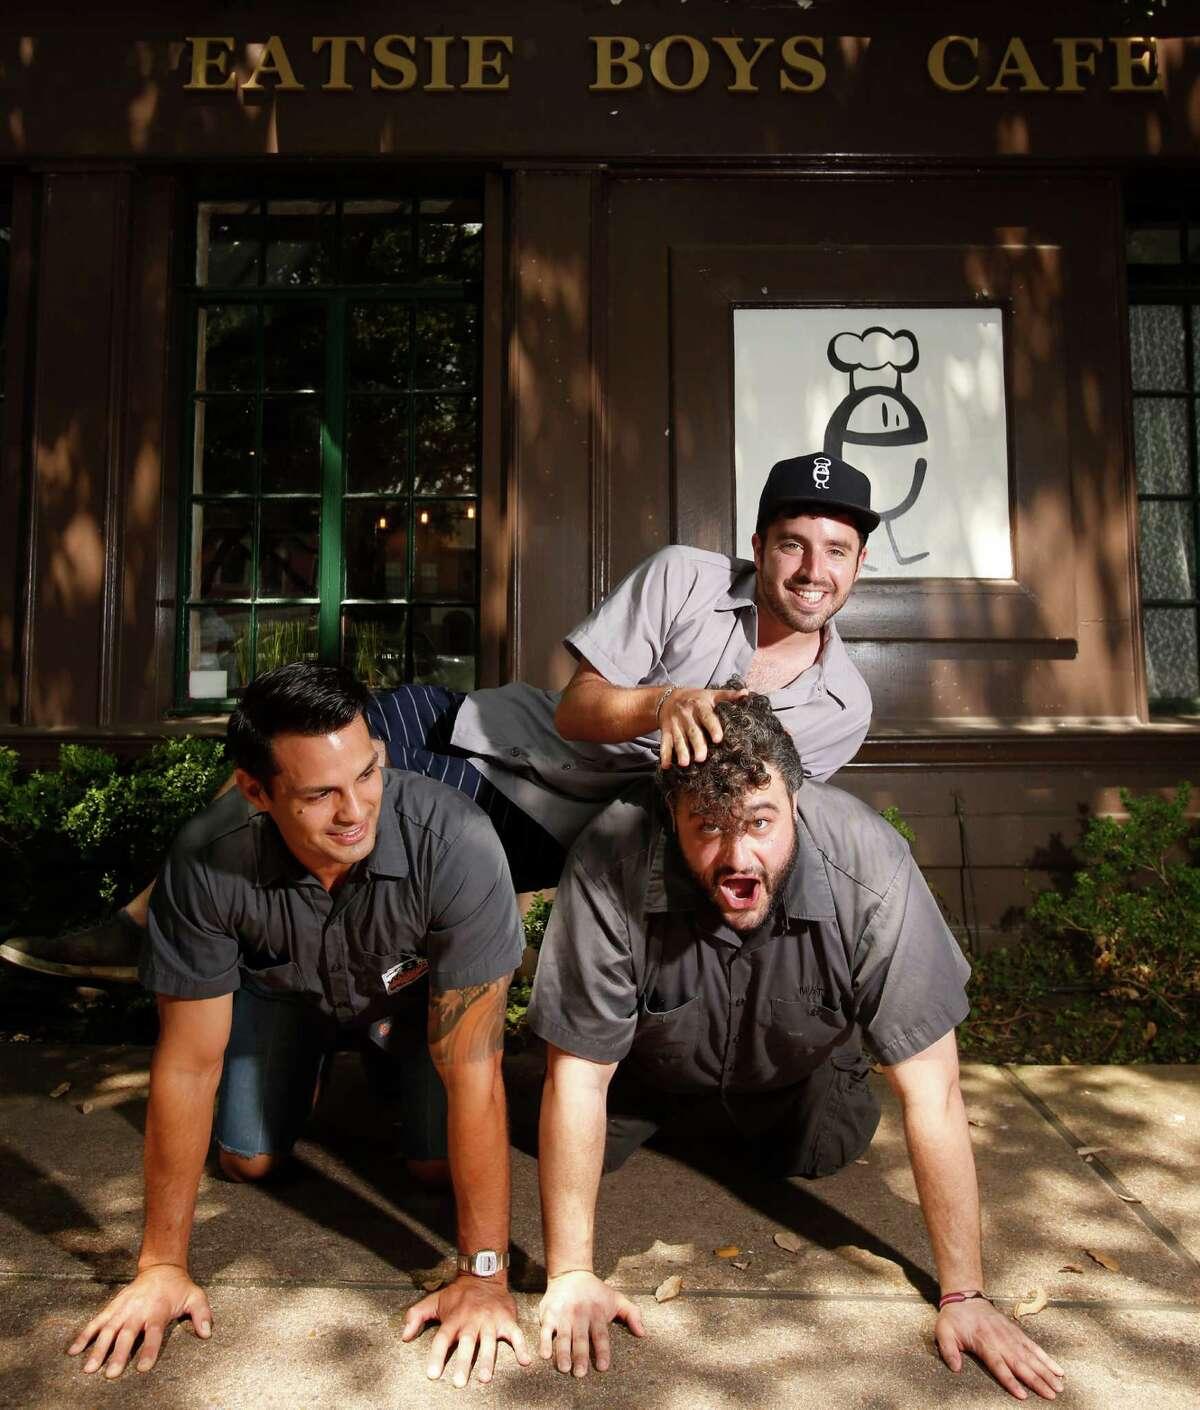 Ryan Soroka, top, Alex Vassilakidis, left, and Matt Marcusat of Eatsie Boys, 4100 Montrose, July 2, 2013 in Houston. (Eric Kayne/For the Chronicle)